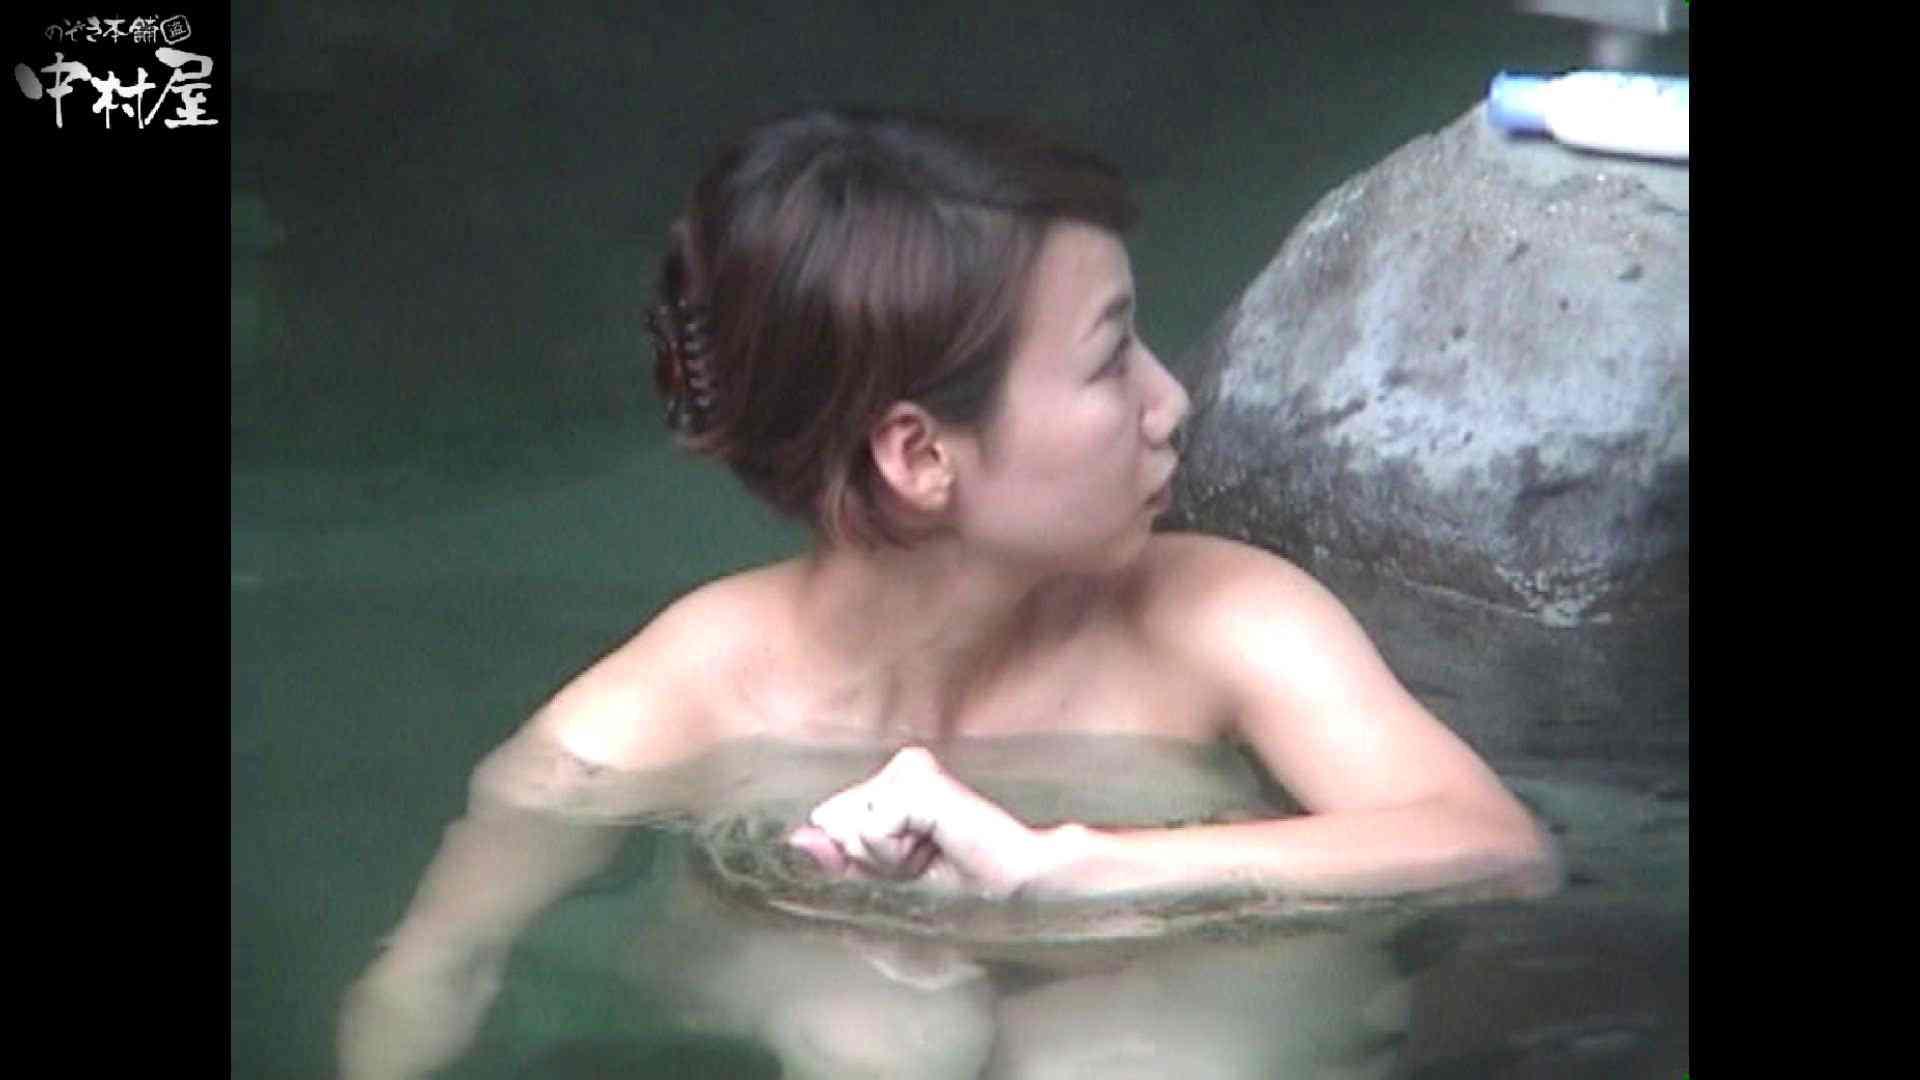 Aquaな露天風呂Vol.951 露天風呂 隠し撮りオマンコ動画紹介 80連発 20